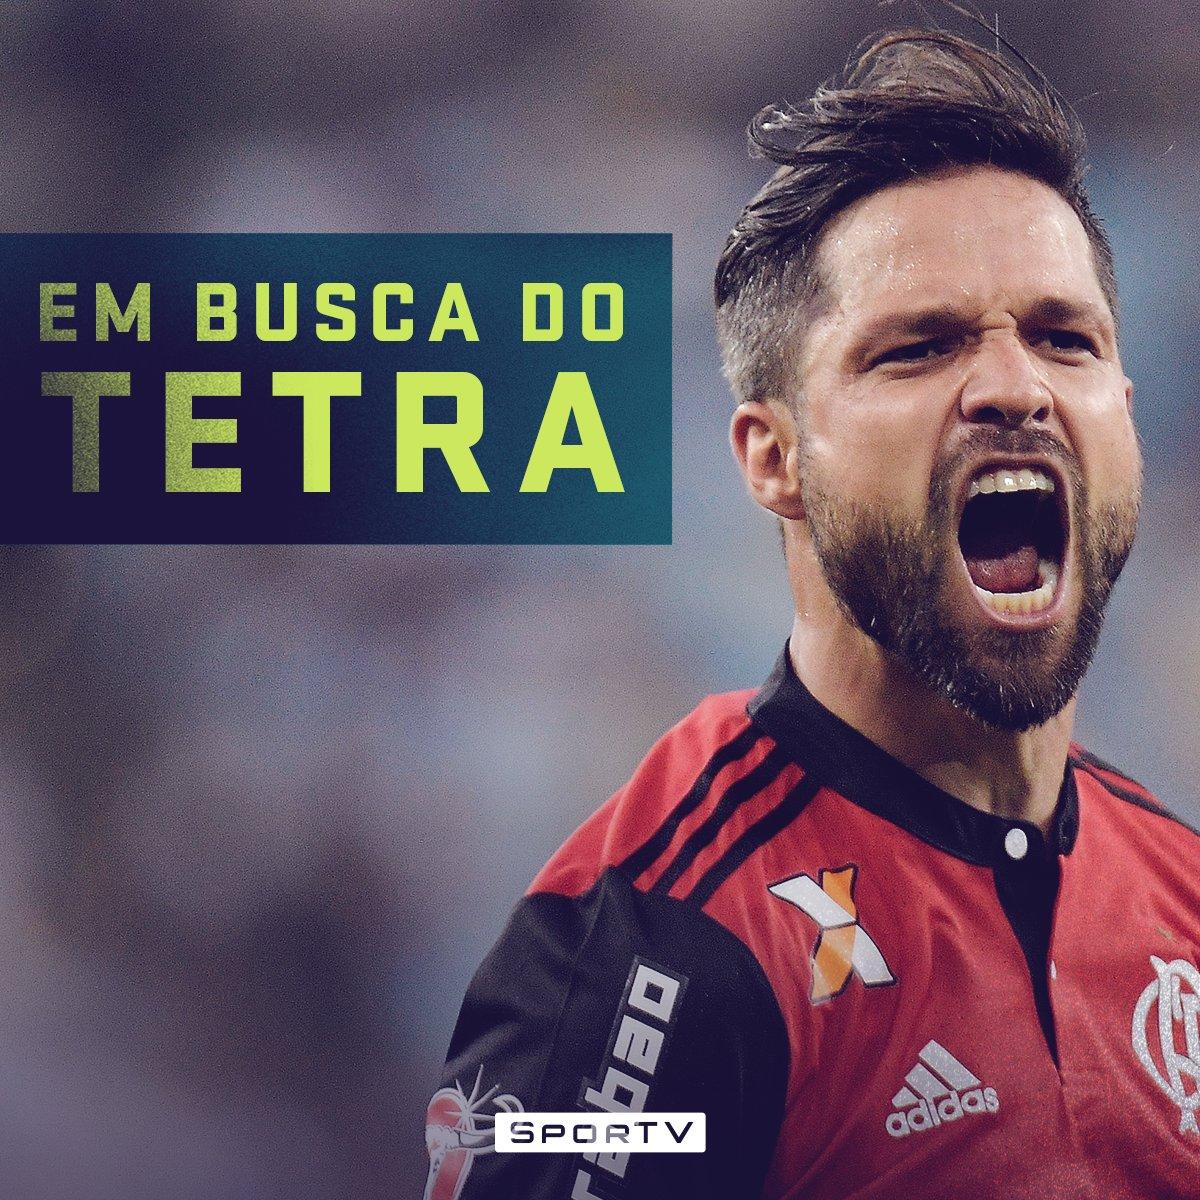 #BrasileiraoNoSporTV